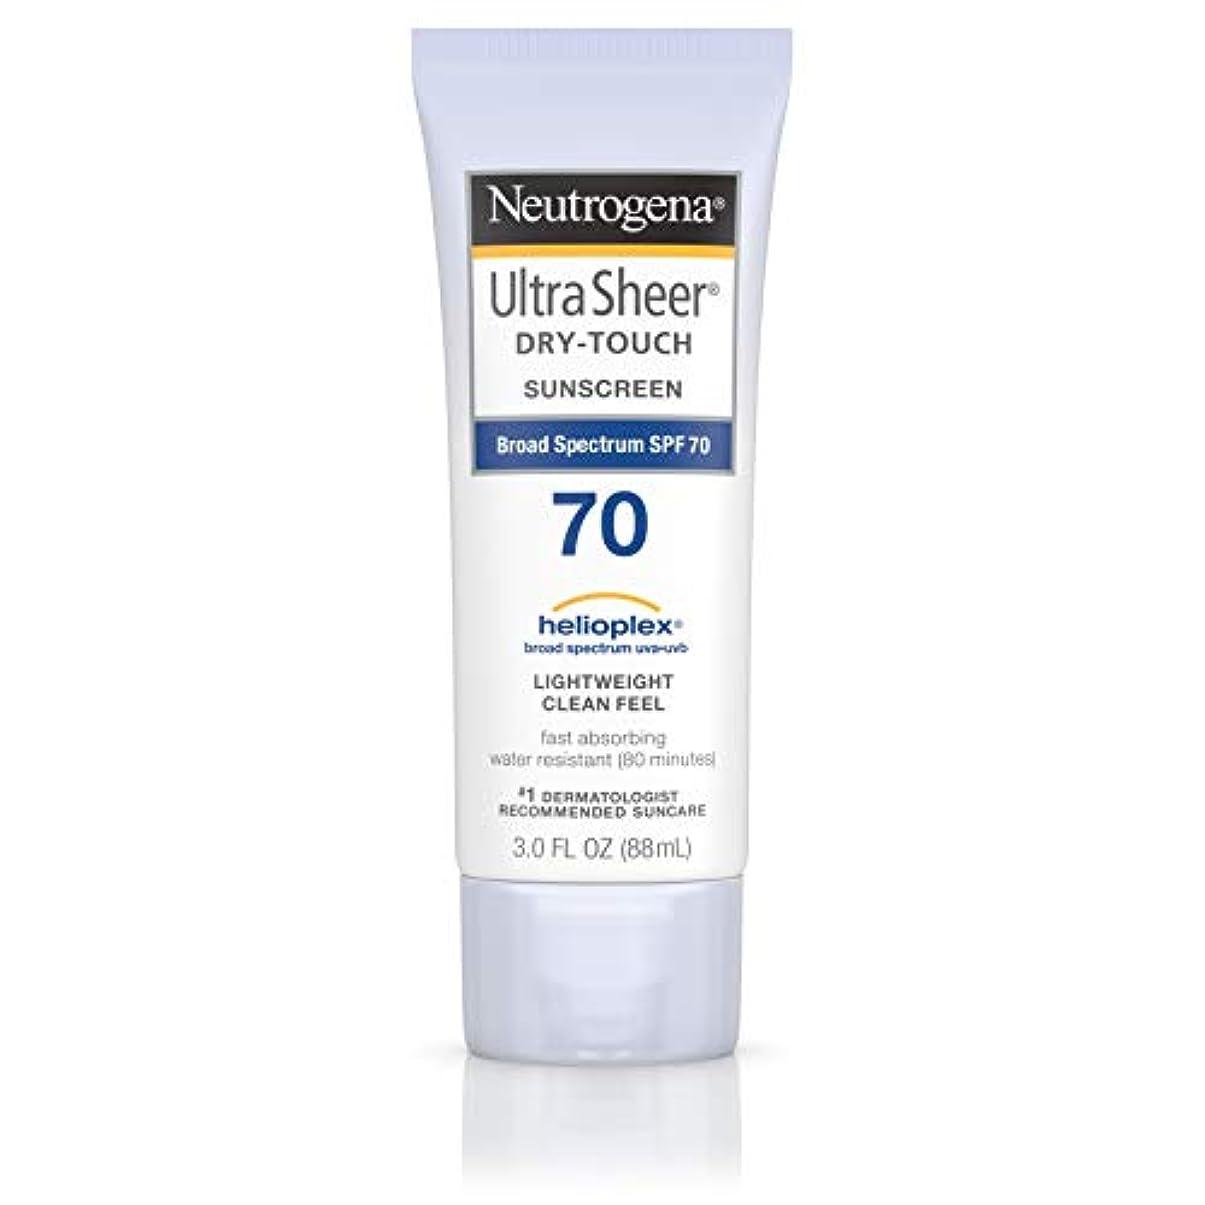 作成者洗う頭痛Neutrogena Ultra Sheer Dry-Touch Sunscreen, SPF 70, 88 ml (並行輸入品)